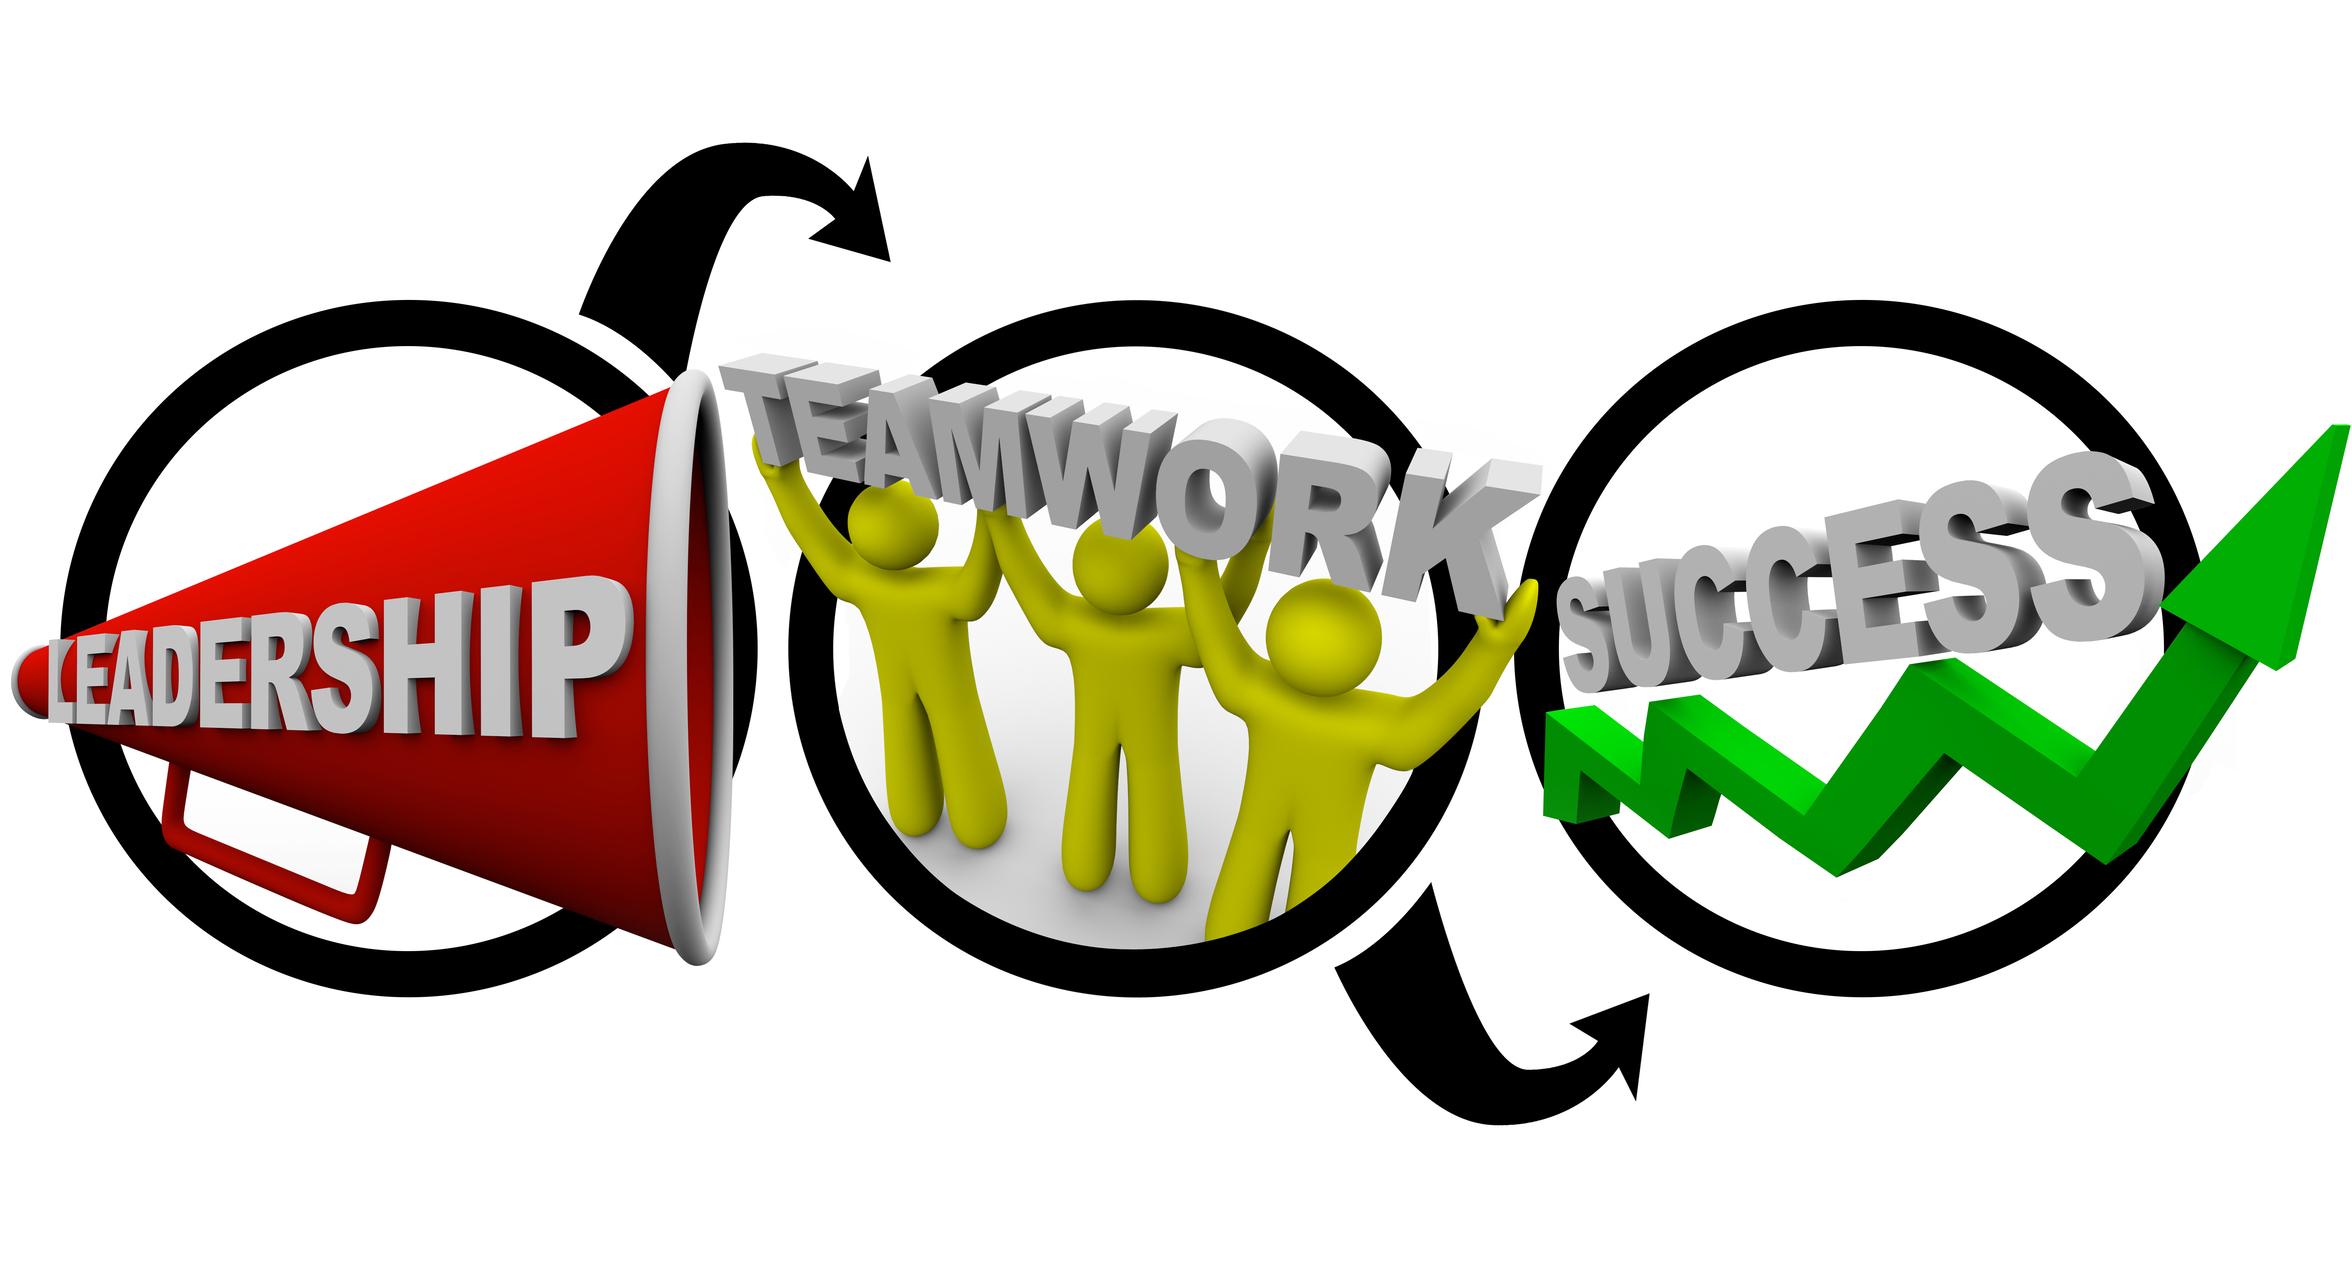 Teamwork and team building training